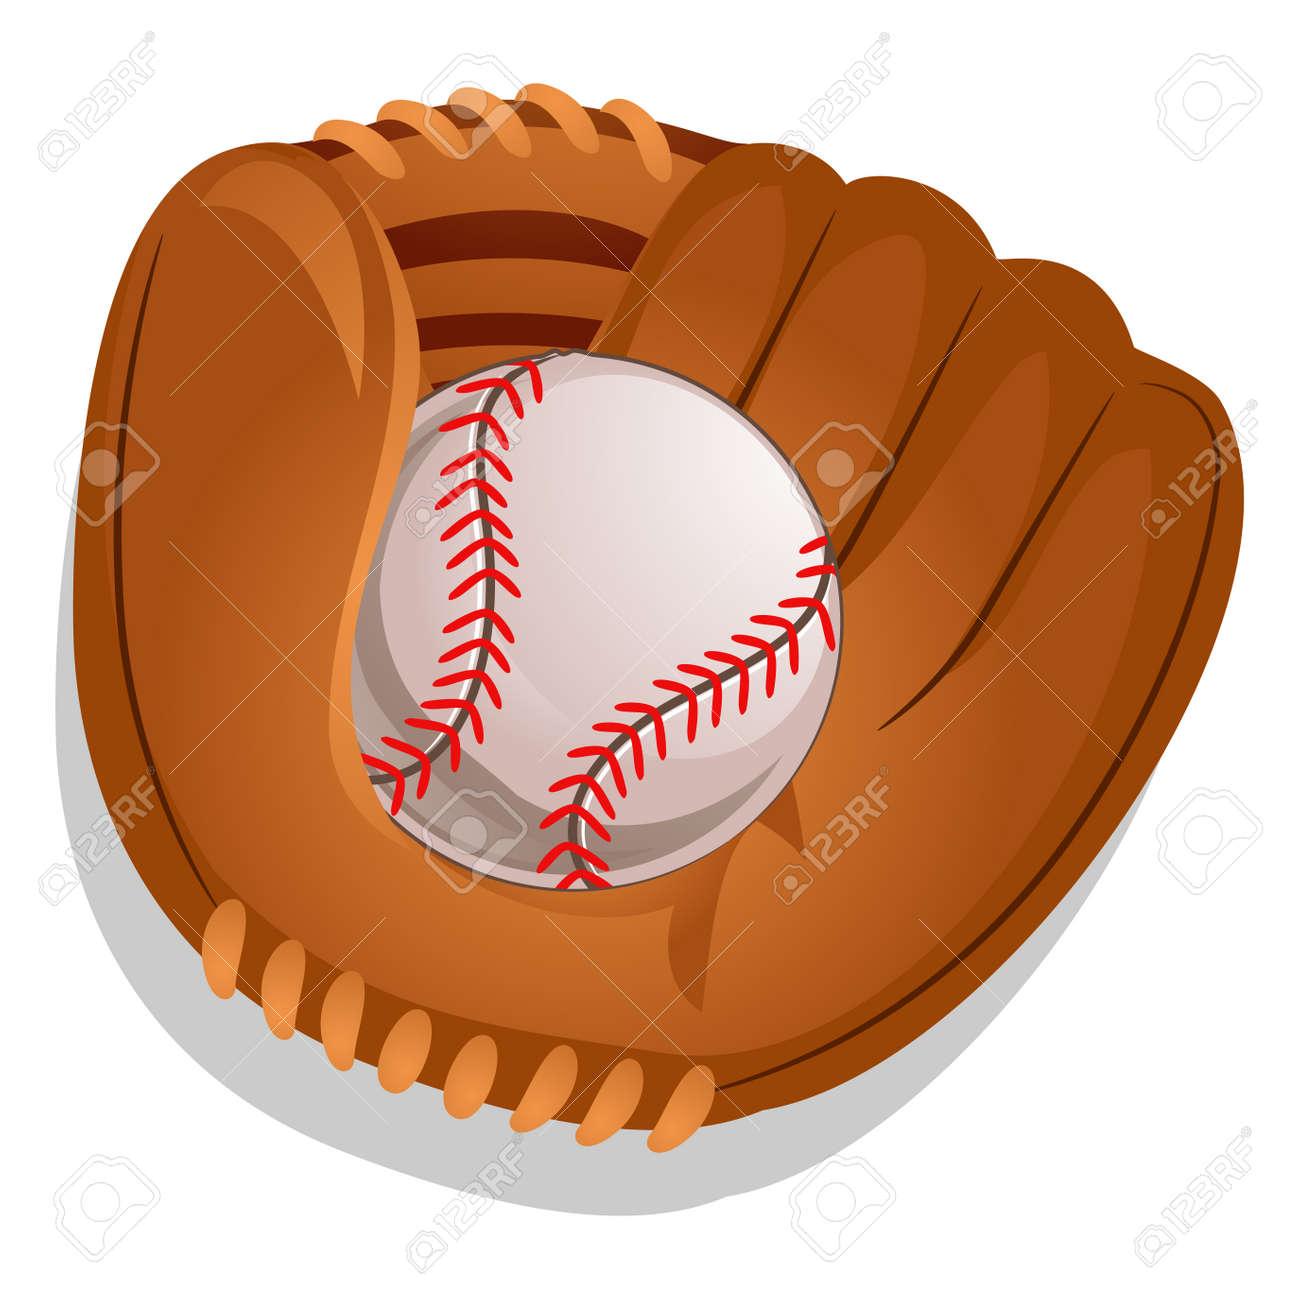 ad1dab2ffbb Vector illustration of baseball gloves with ball royalty free jpg 1300x1300 Baseball  gloves ball